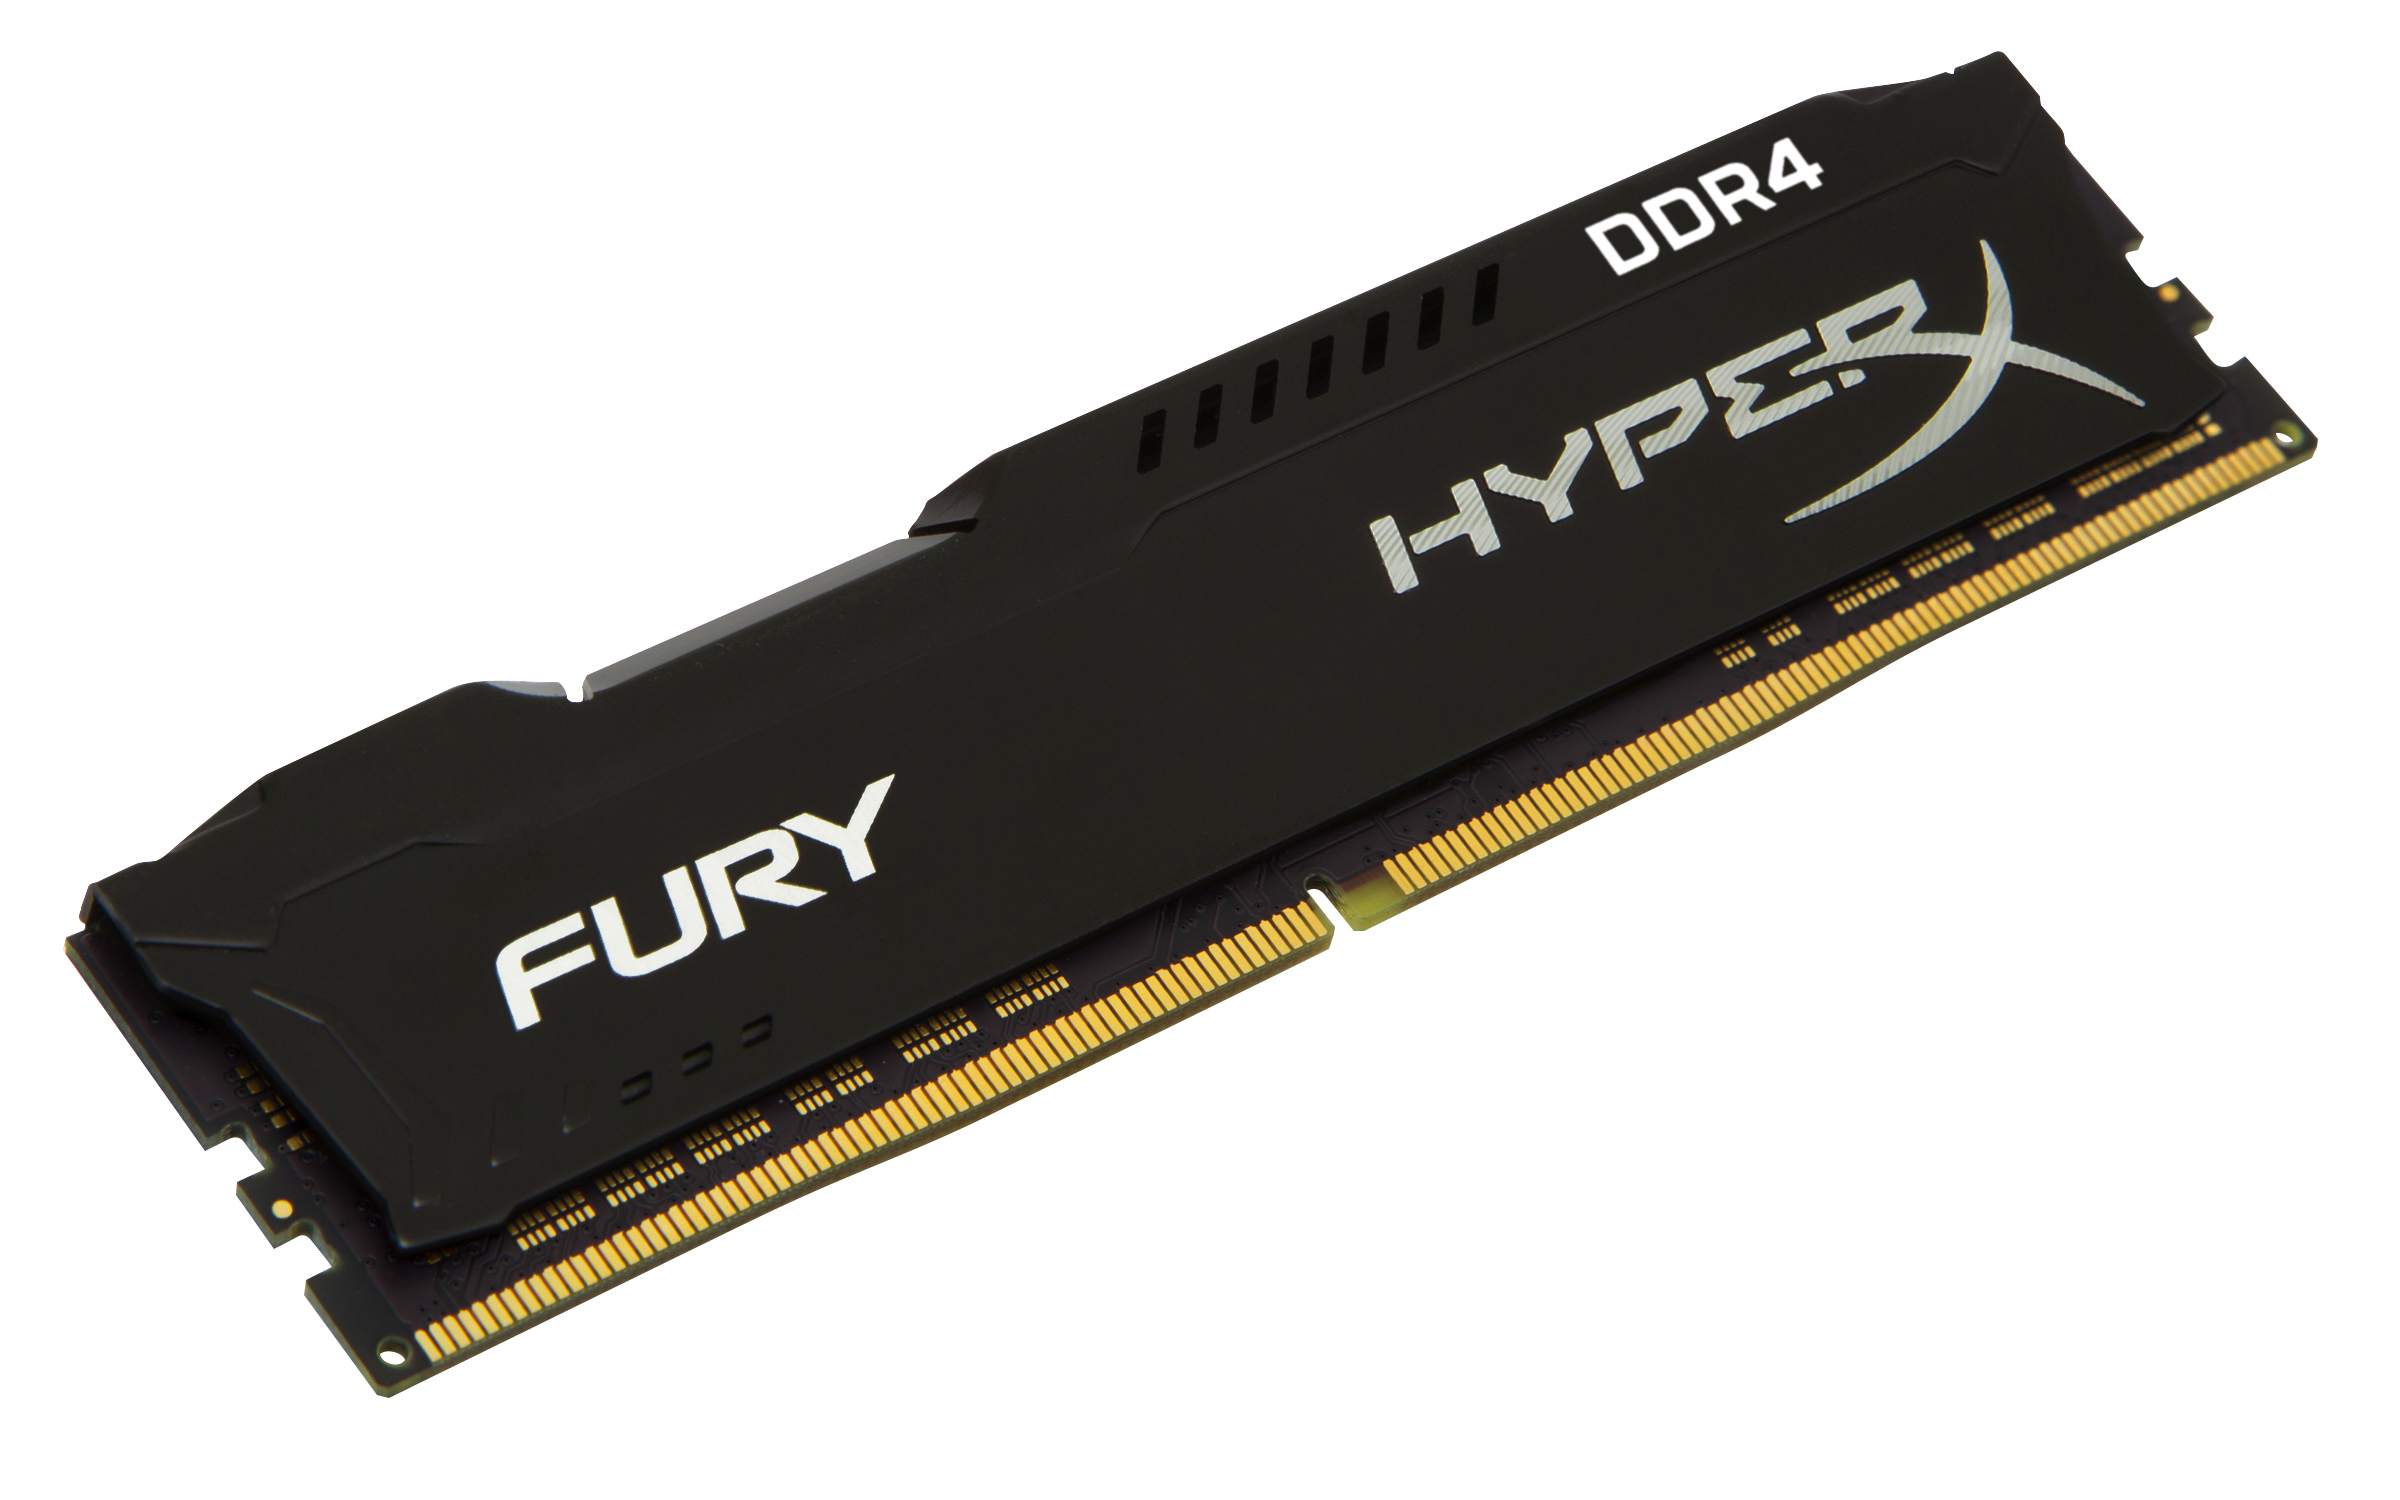 HyperX Fury 16GB 2133MHz DDR4 CL14 DIMM, černý